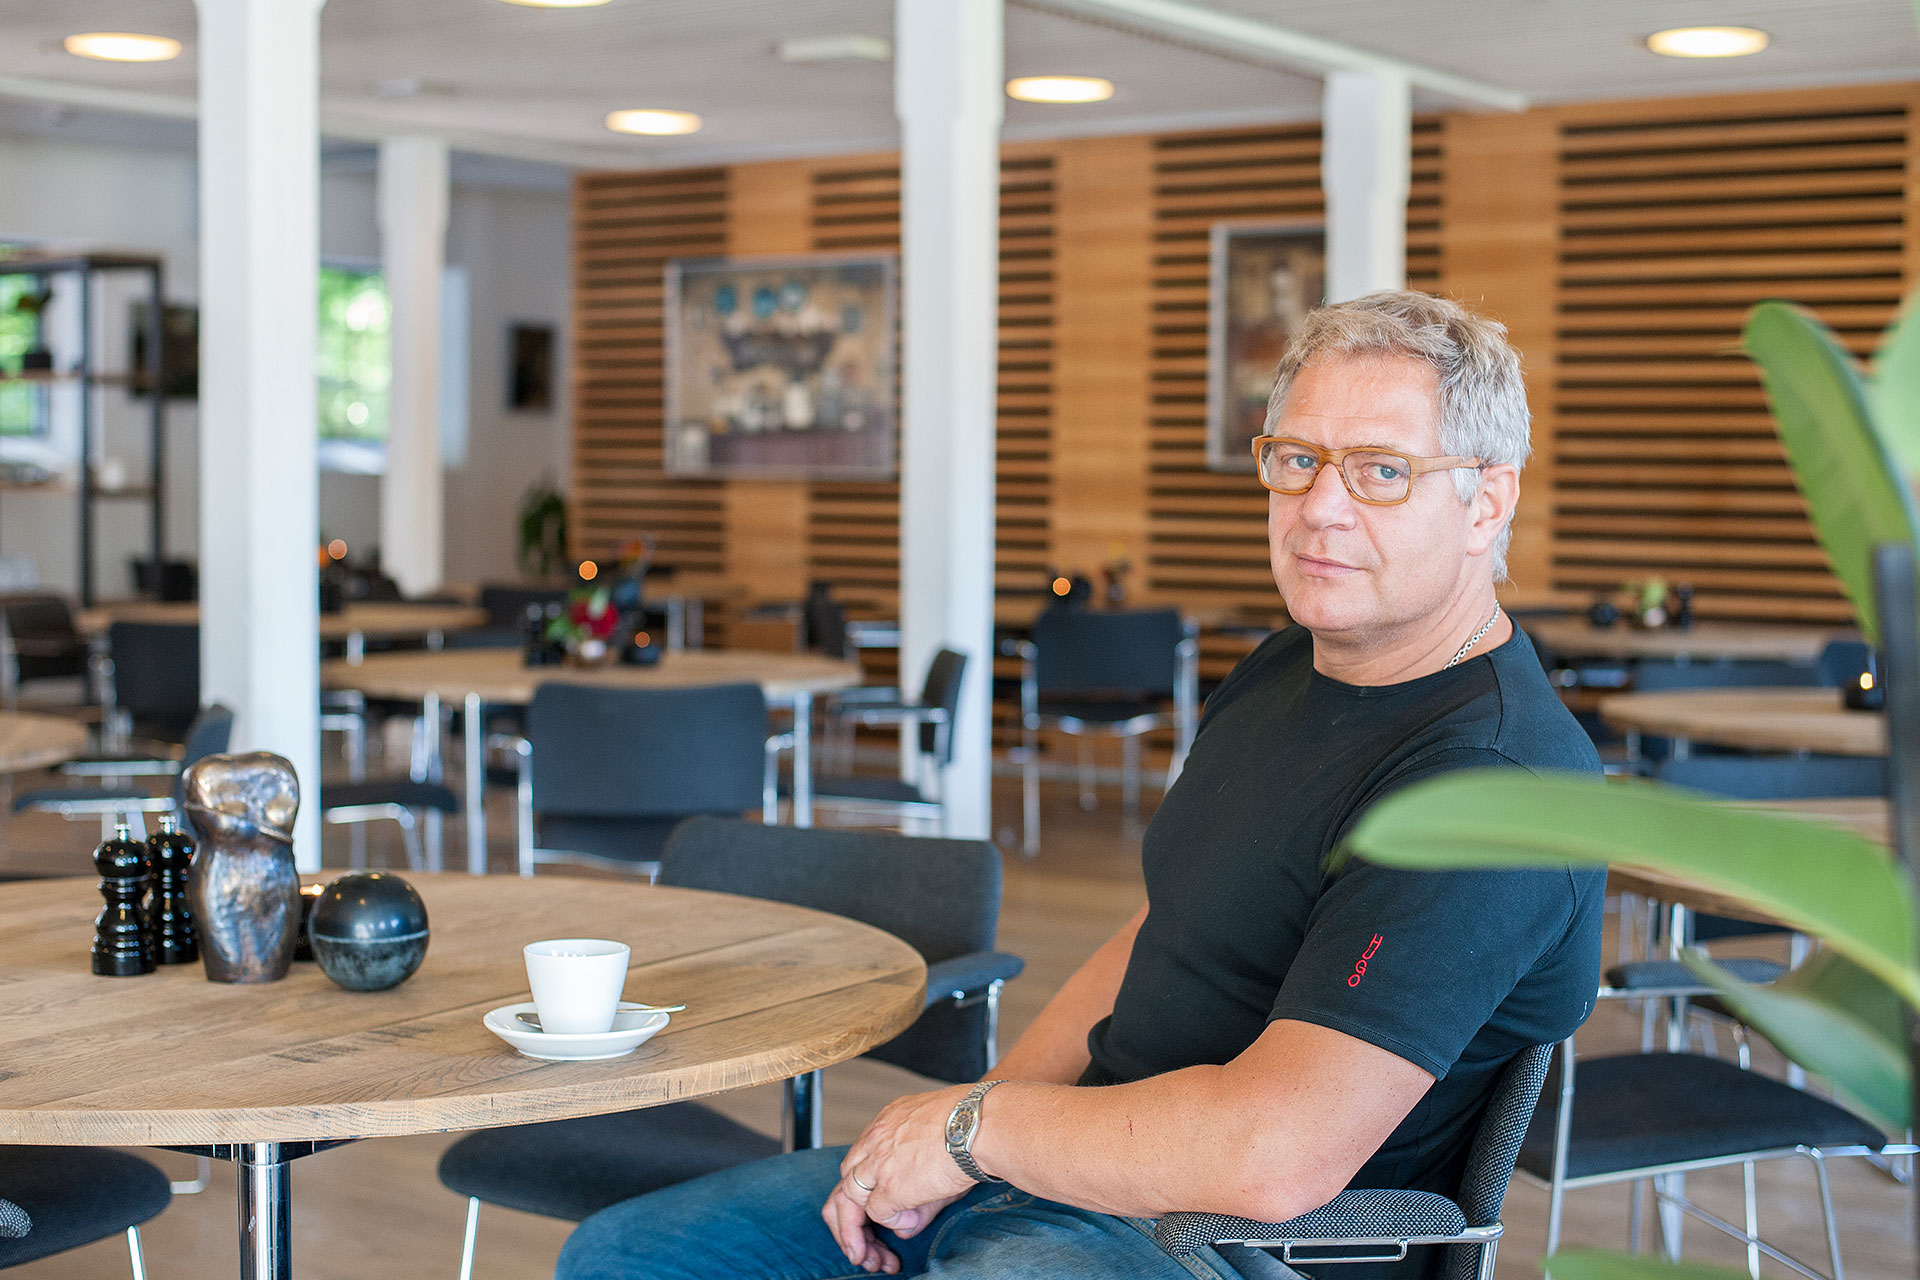 Bjarne Søndergaard